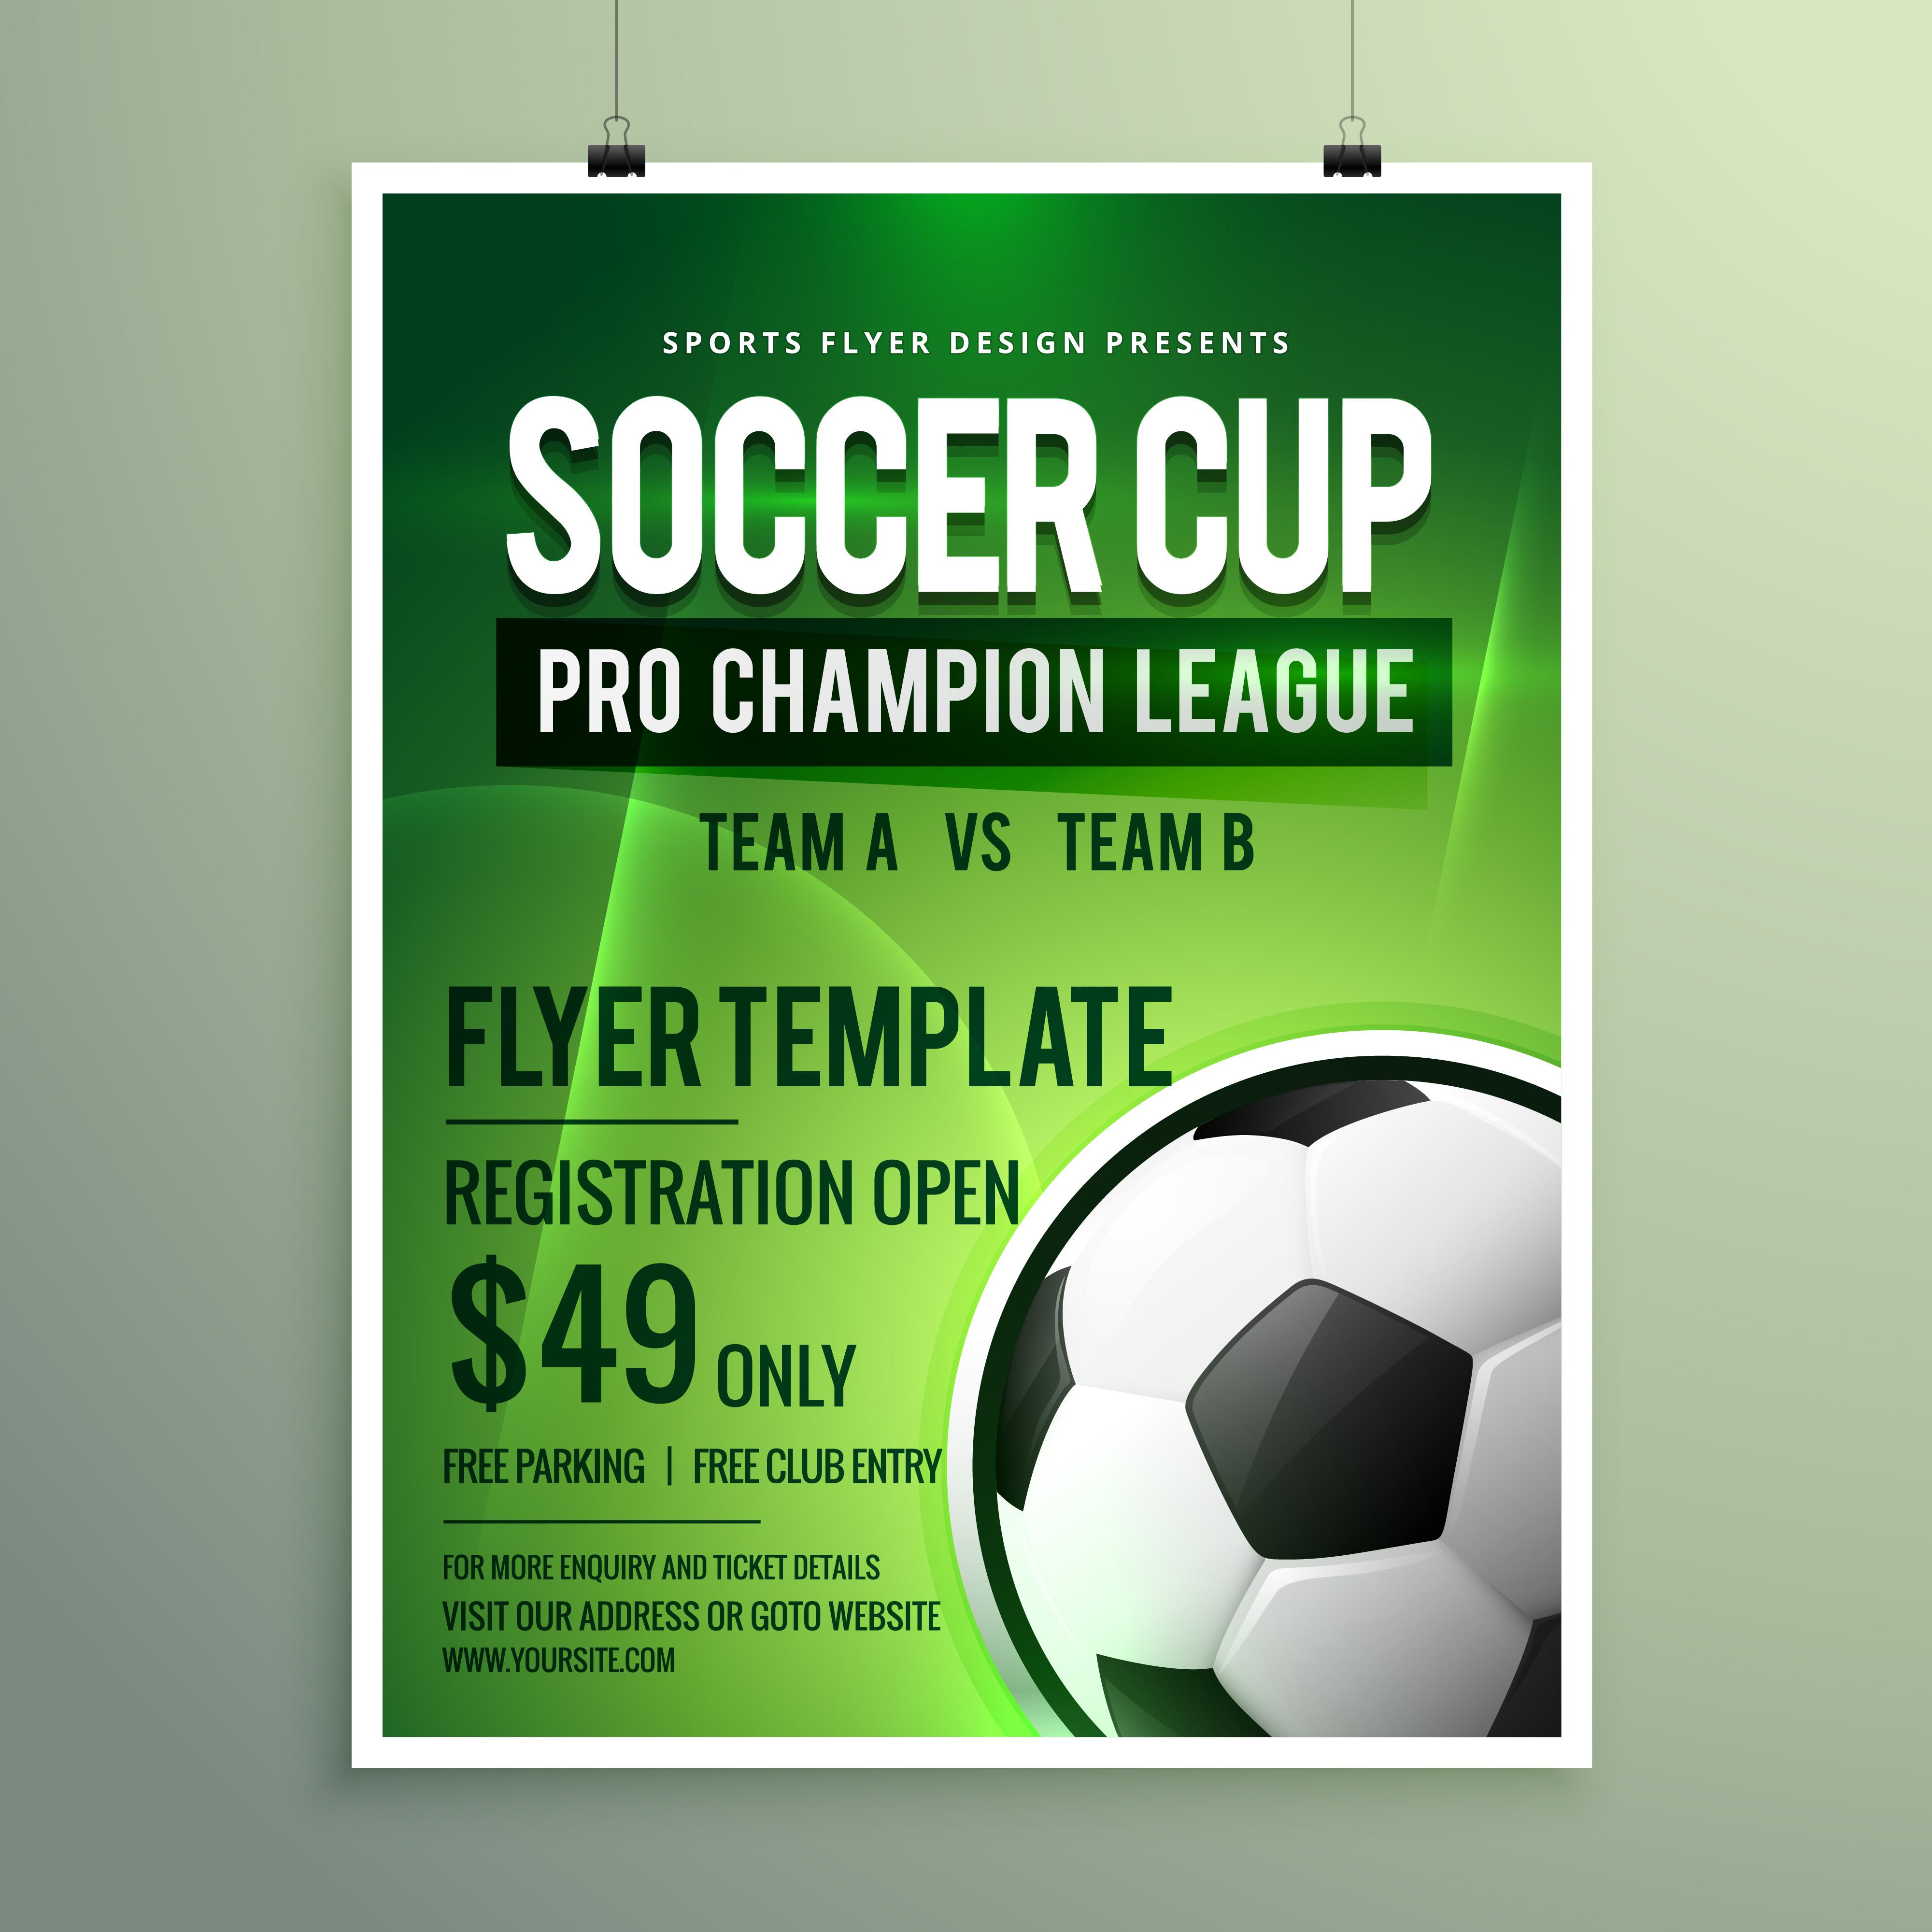 Soccer League Sports Event Flyer Design Download Free Vector Art